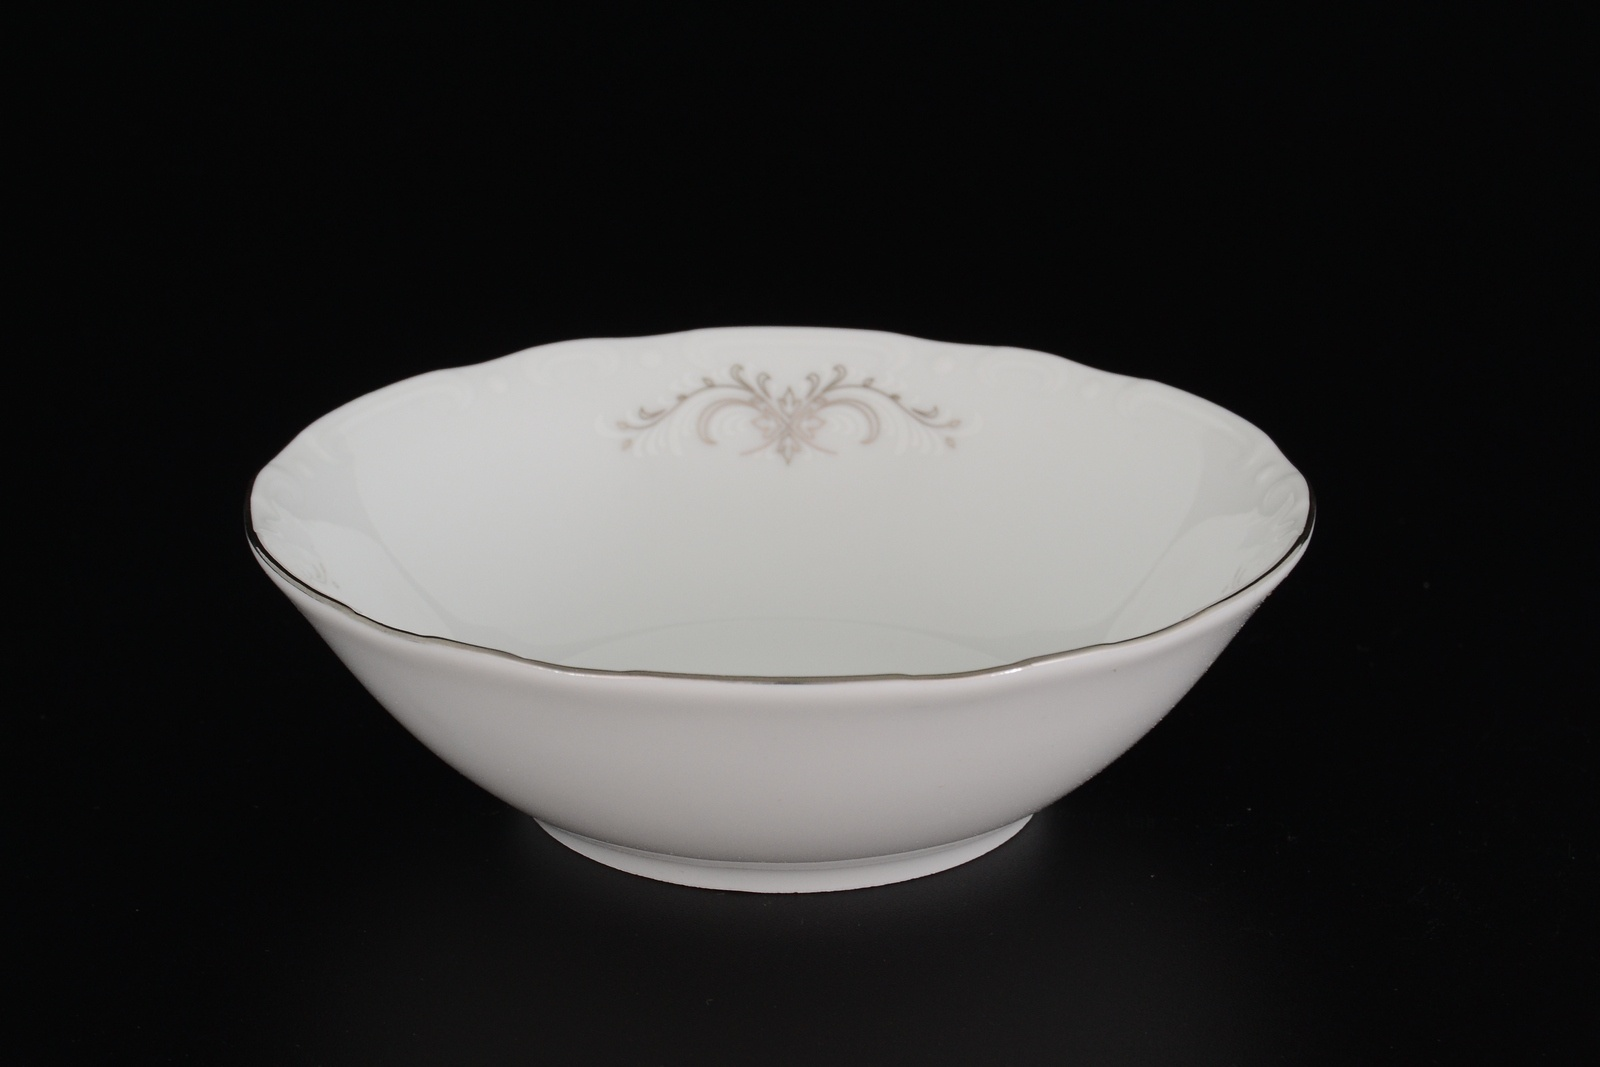 Набор салатников Thun 13 см, 15931, белый, серебристый, 6 шт